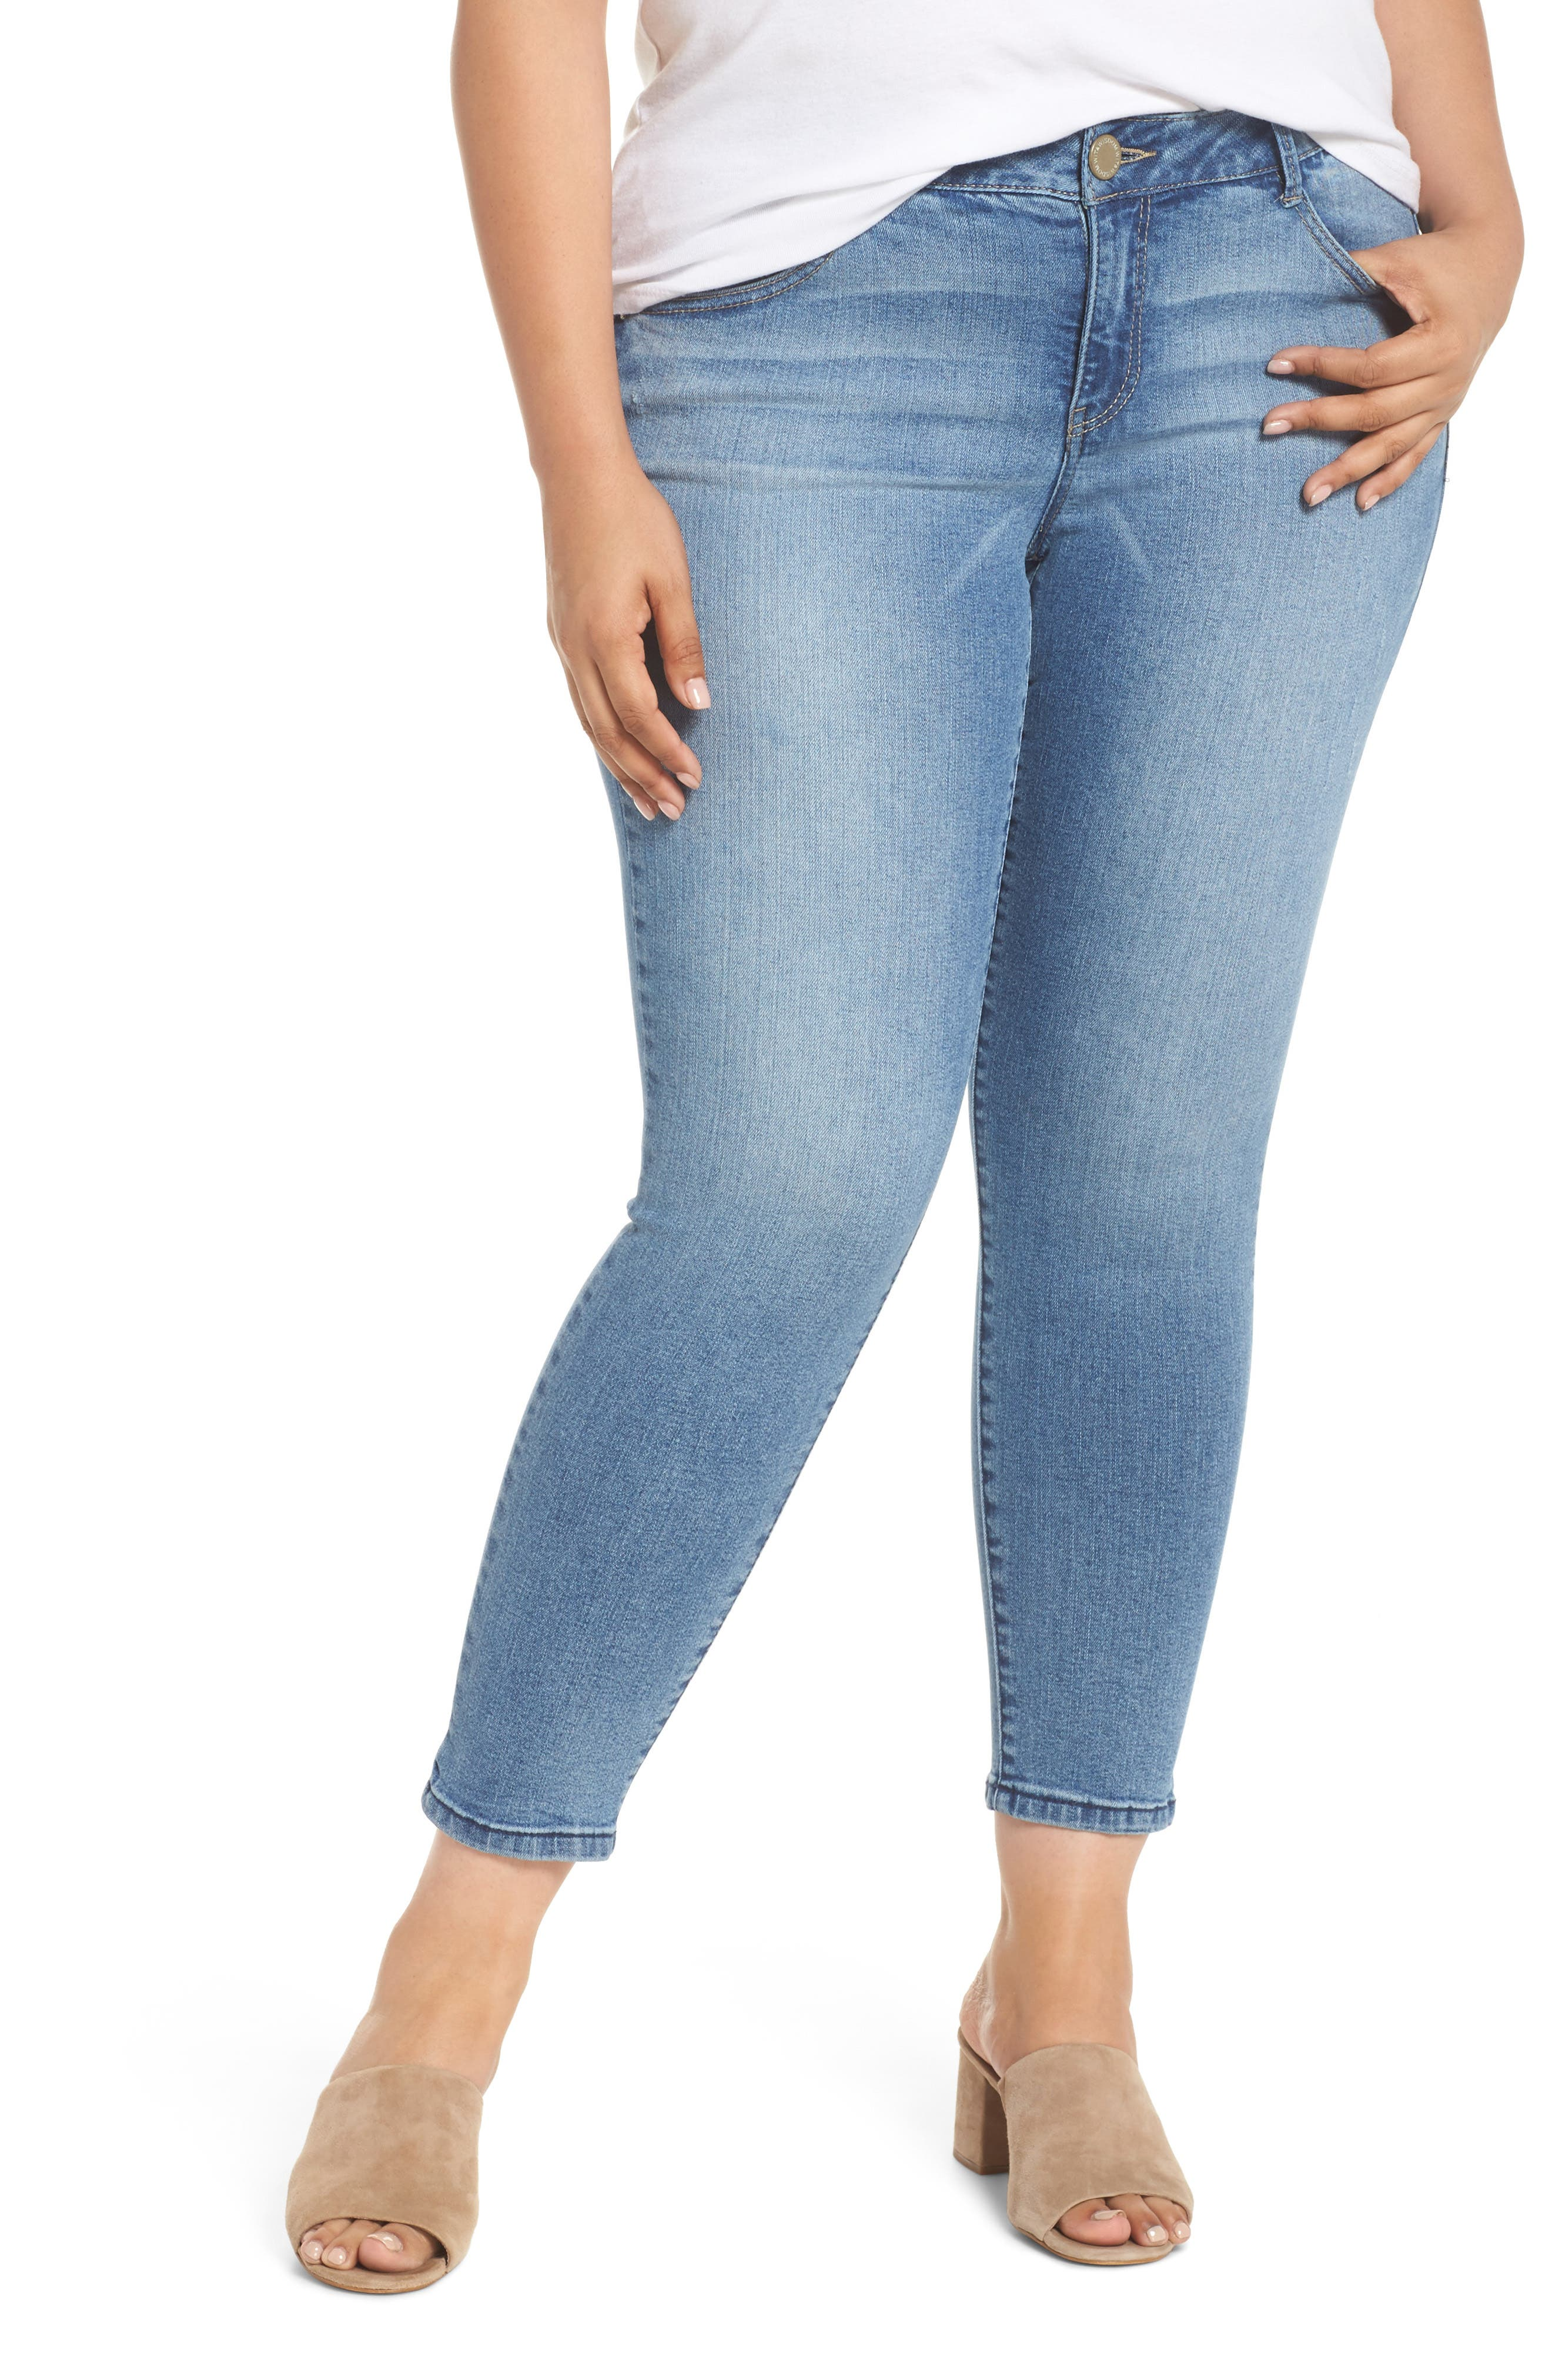 Ab-solution Stretch Ankle Skimmer Jeans,                         Main,                         color, Light Blue